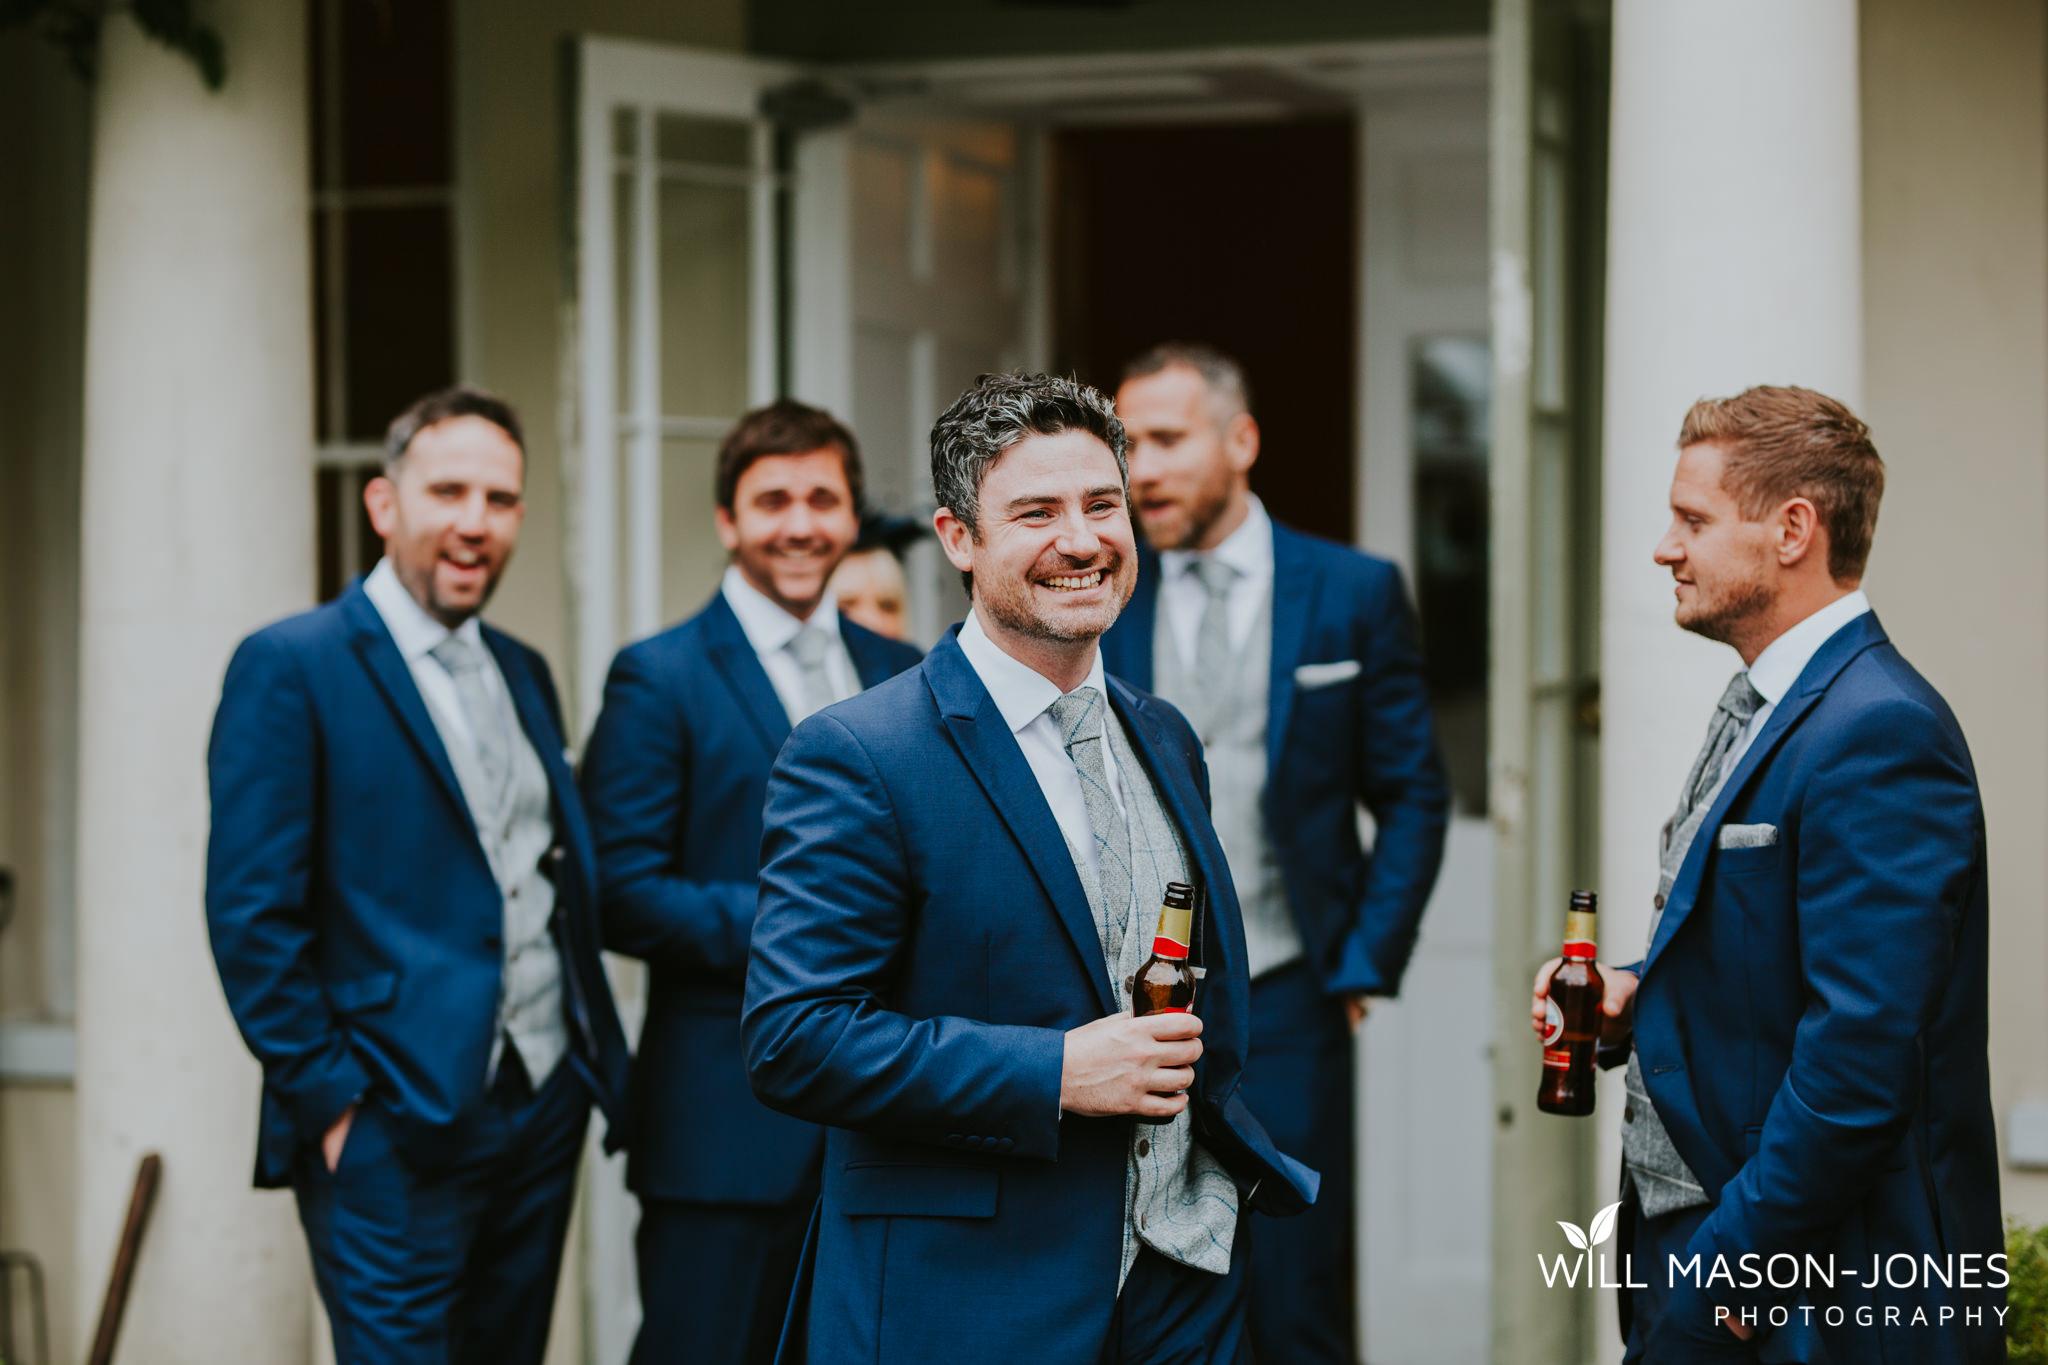 plas-glansevin-wet-rainy-bridal-wedding-preparations-swansea-photographers-1.jpg